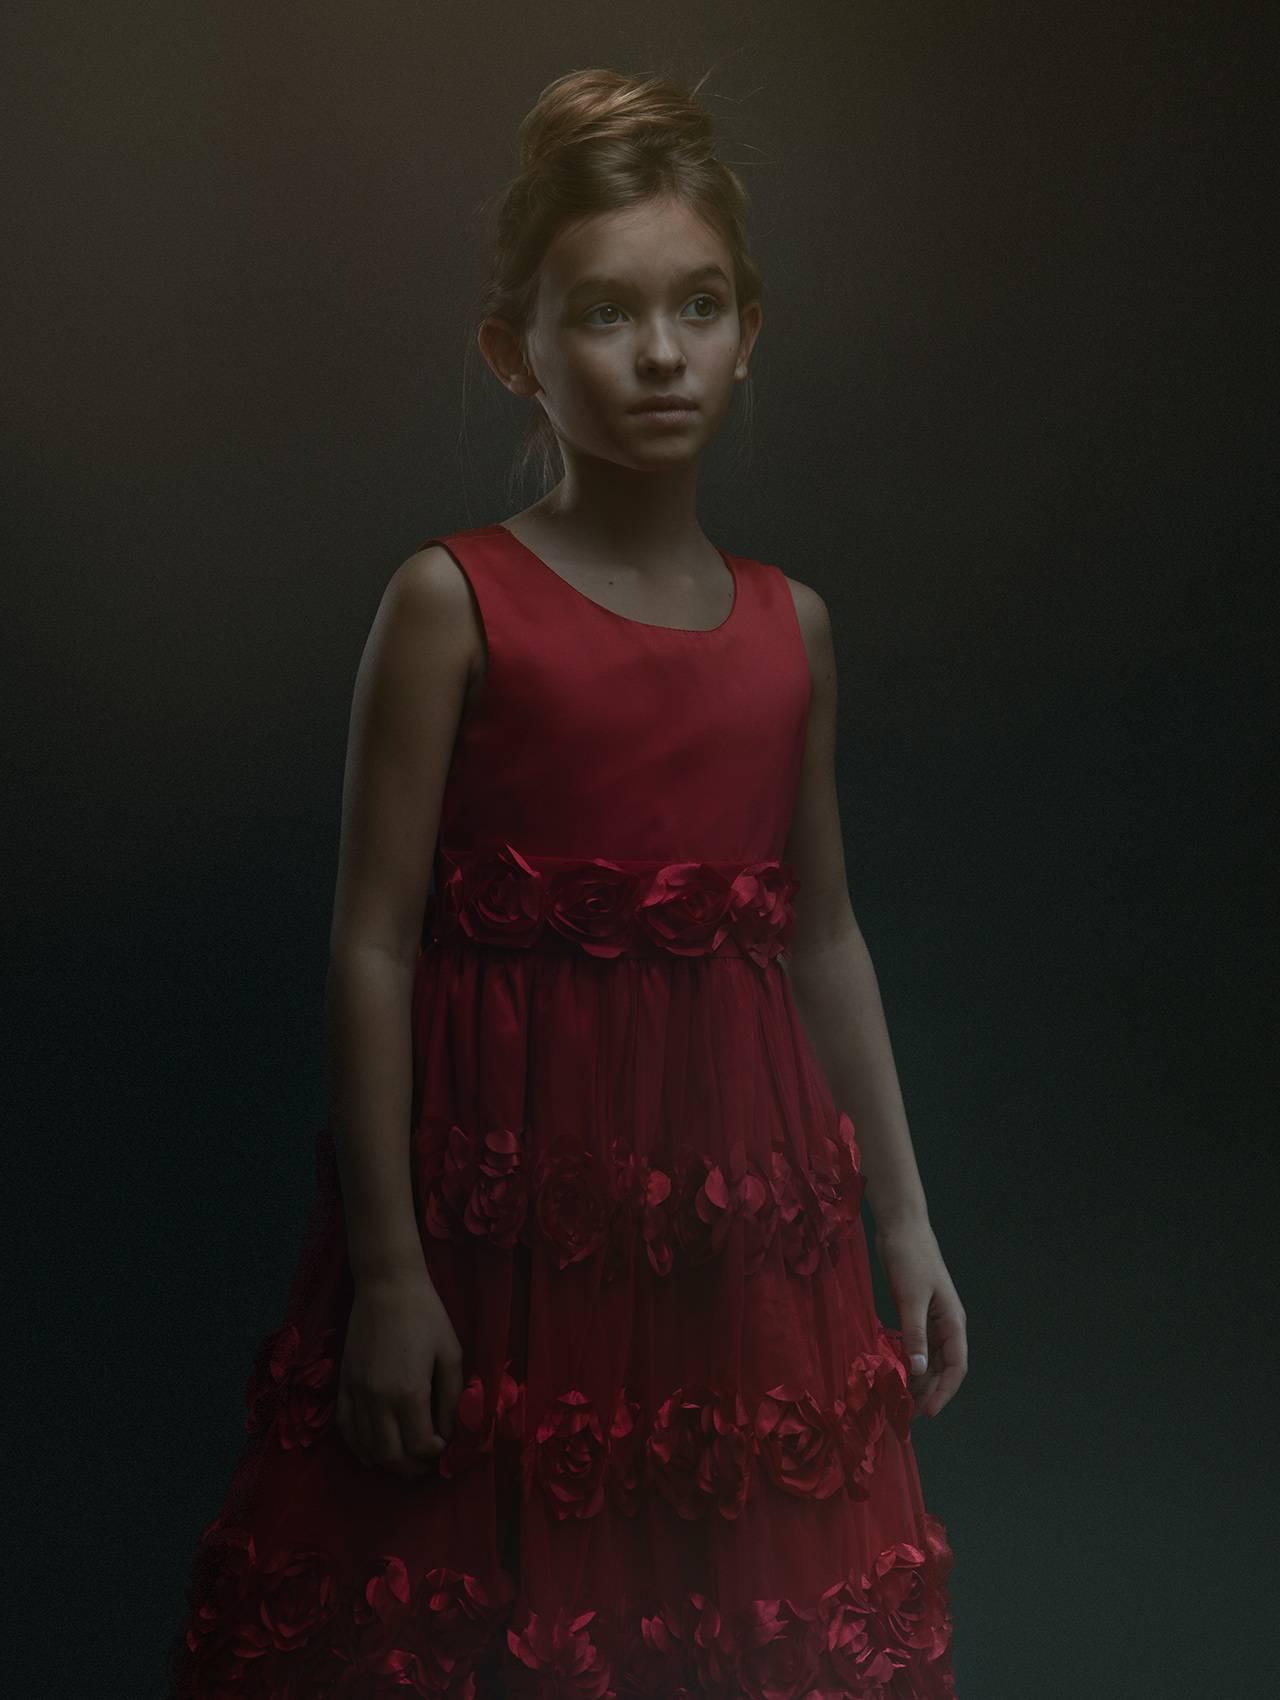 red_dress2.jpg